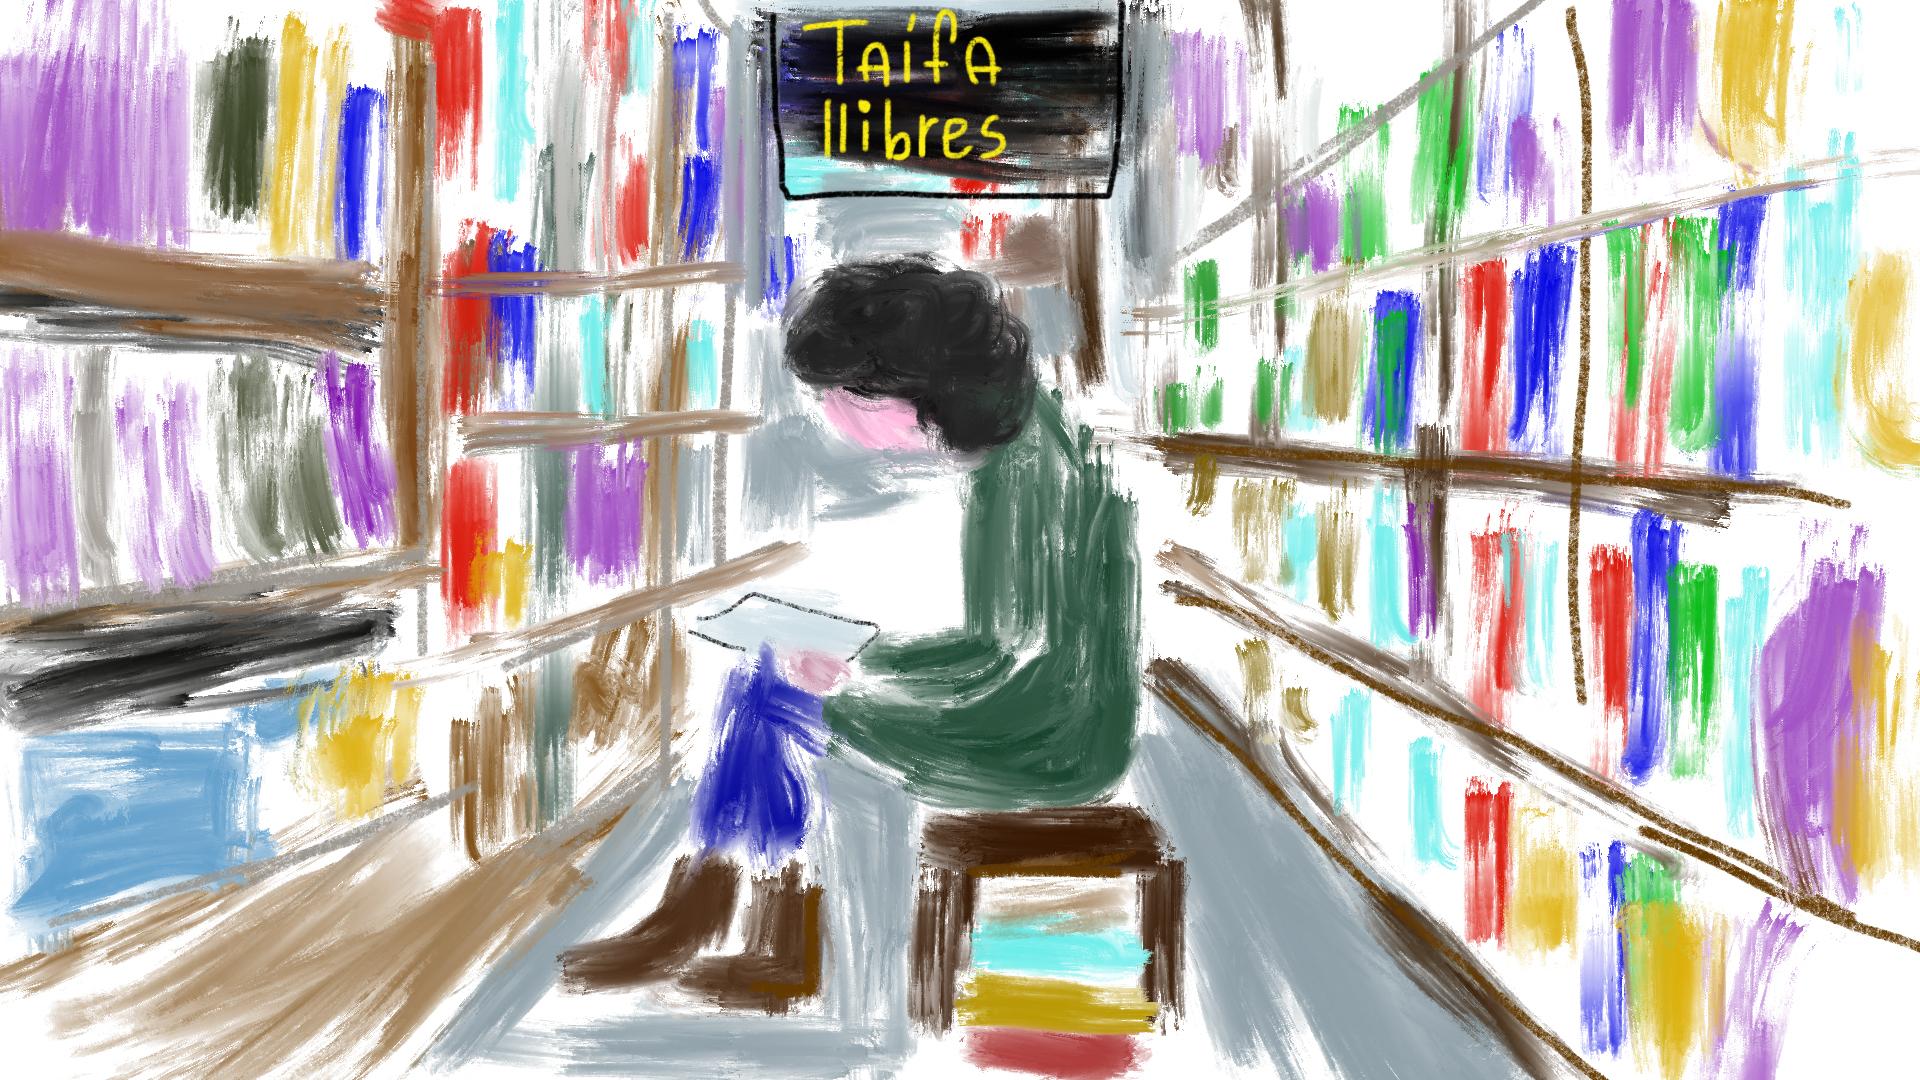 taifa-llibres-gracia